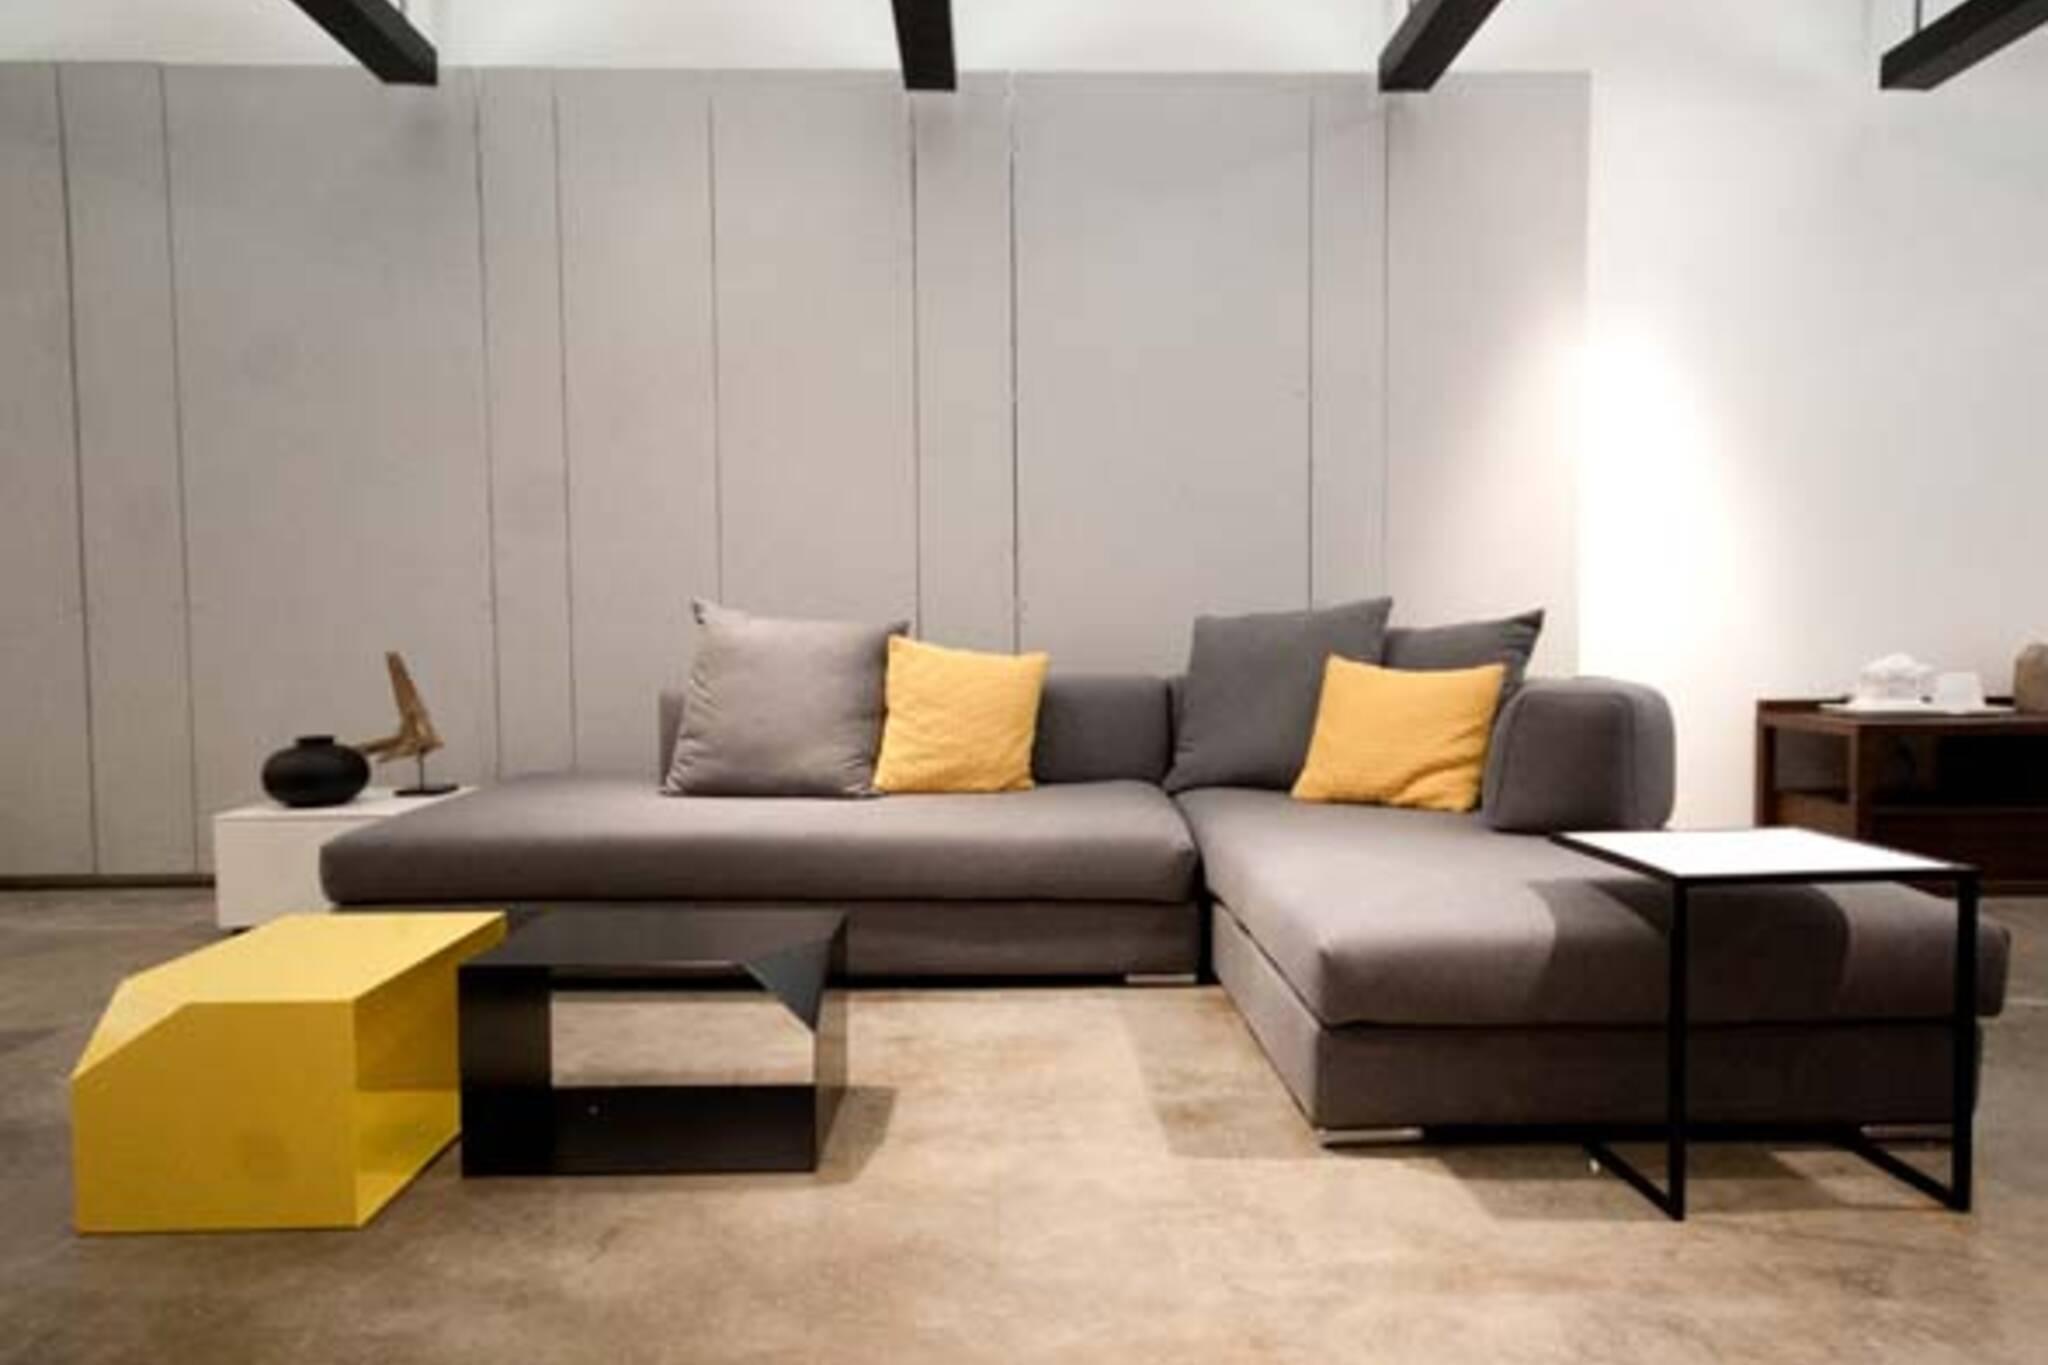 Domison Furniture